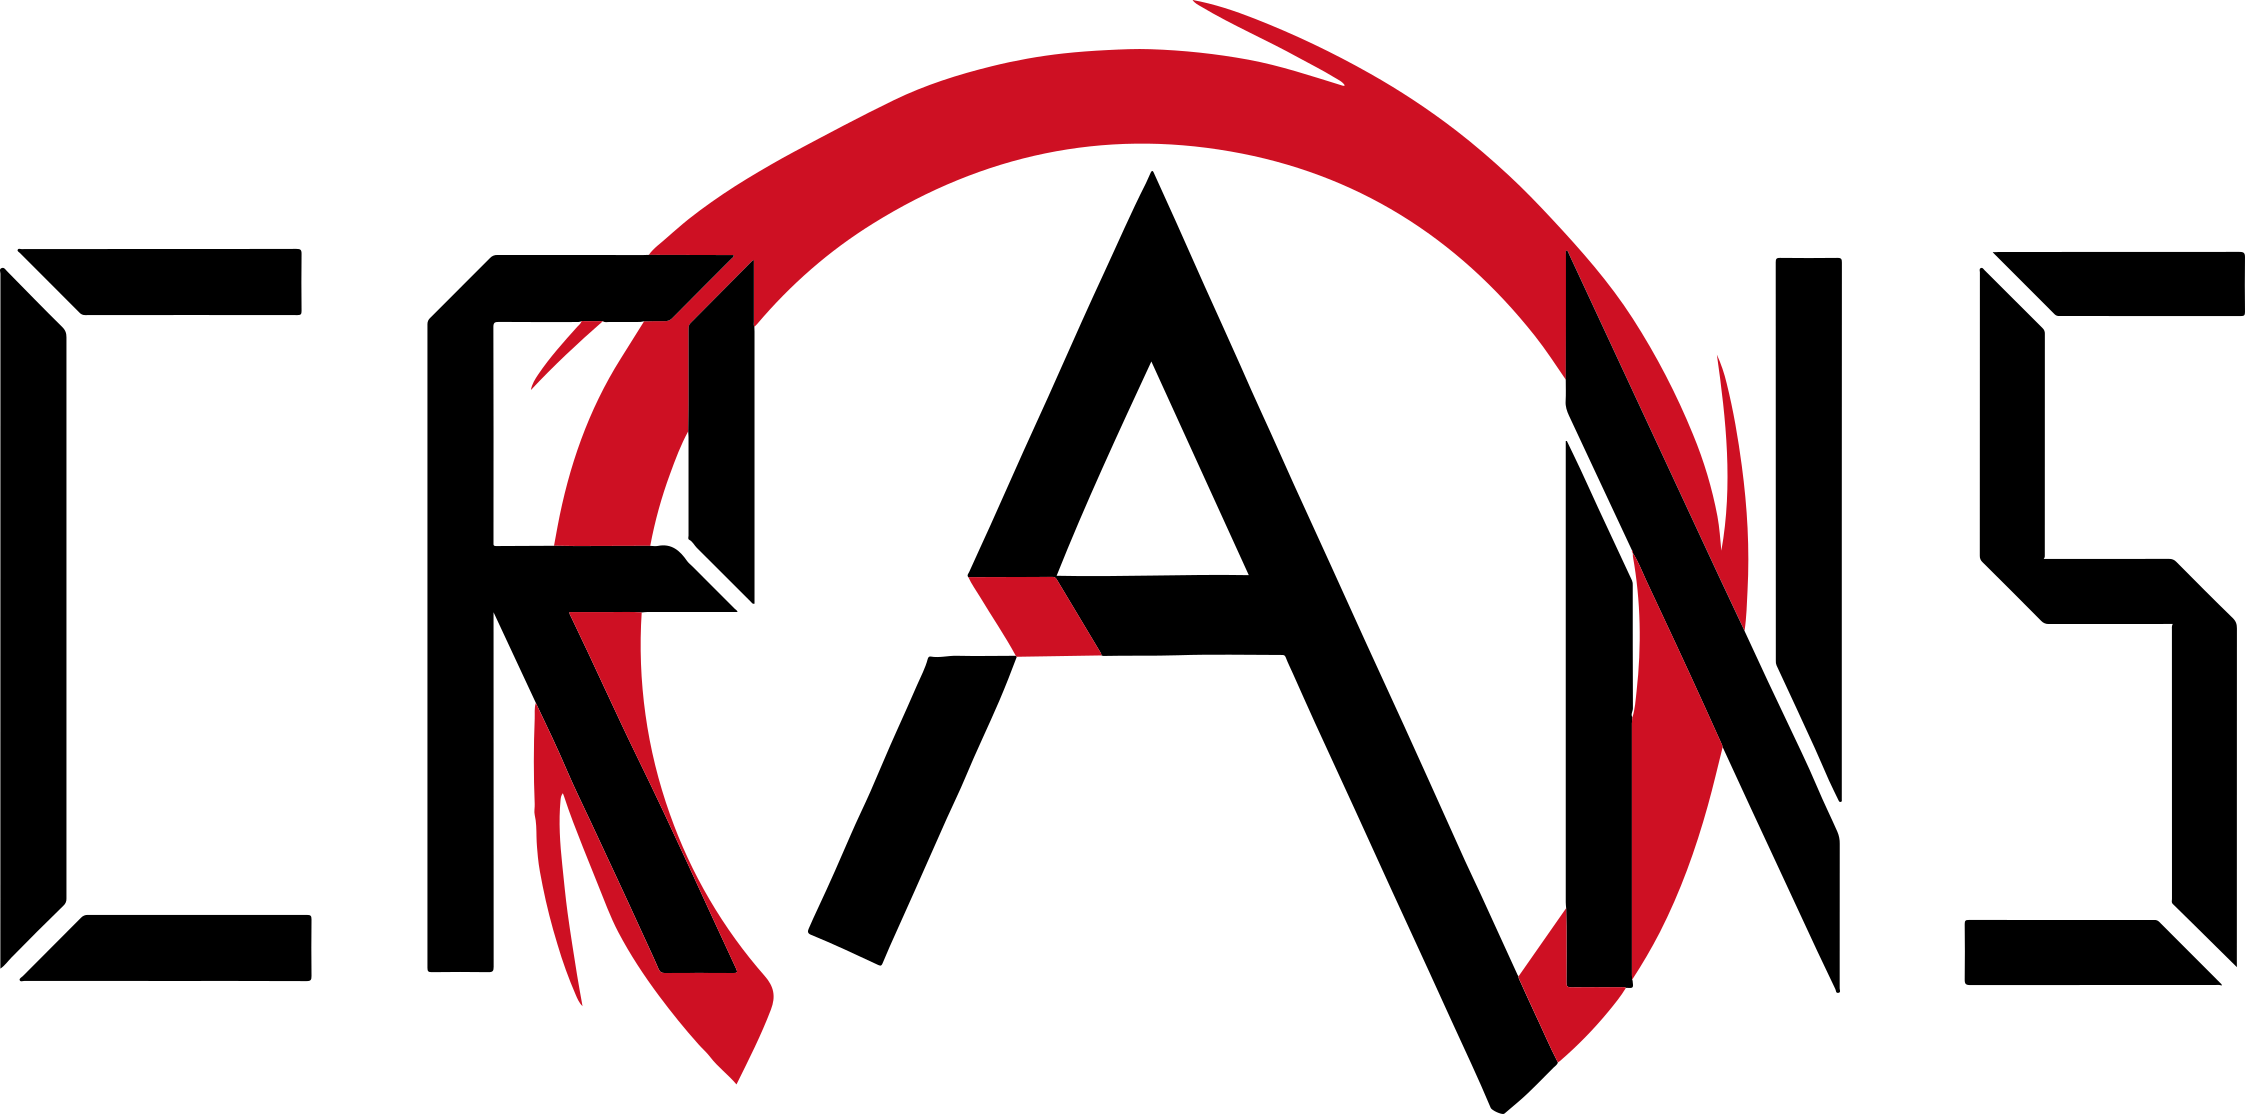 Seminaires/2019-2020/images/logo-coeur_black.png